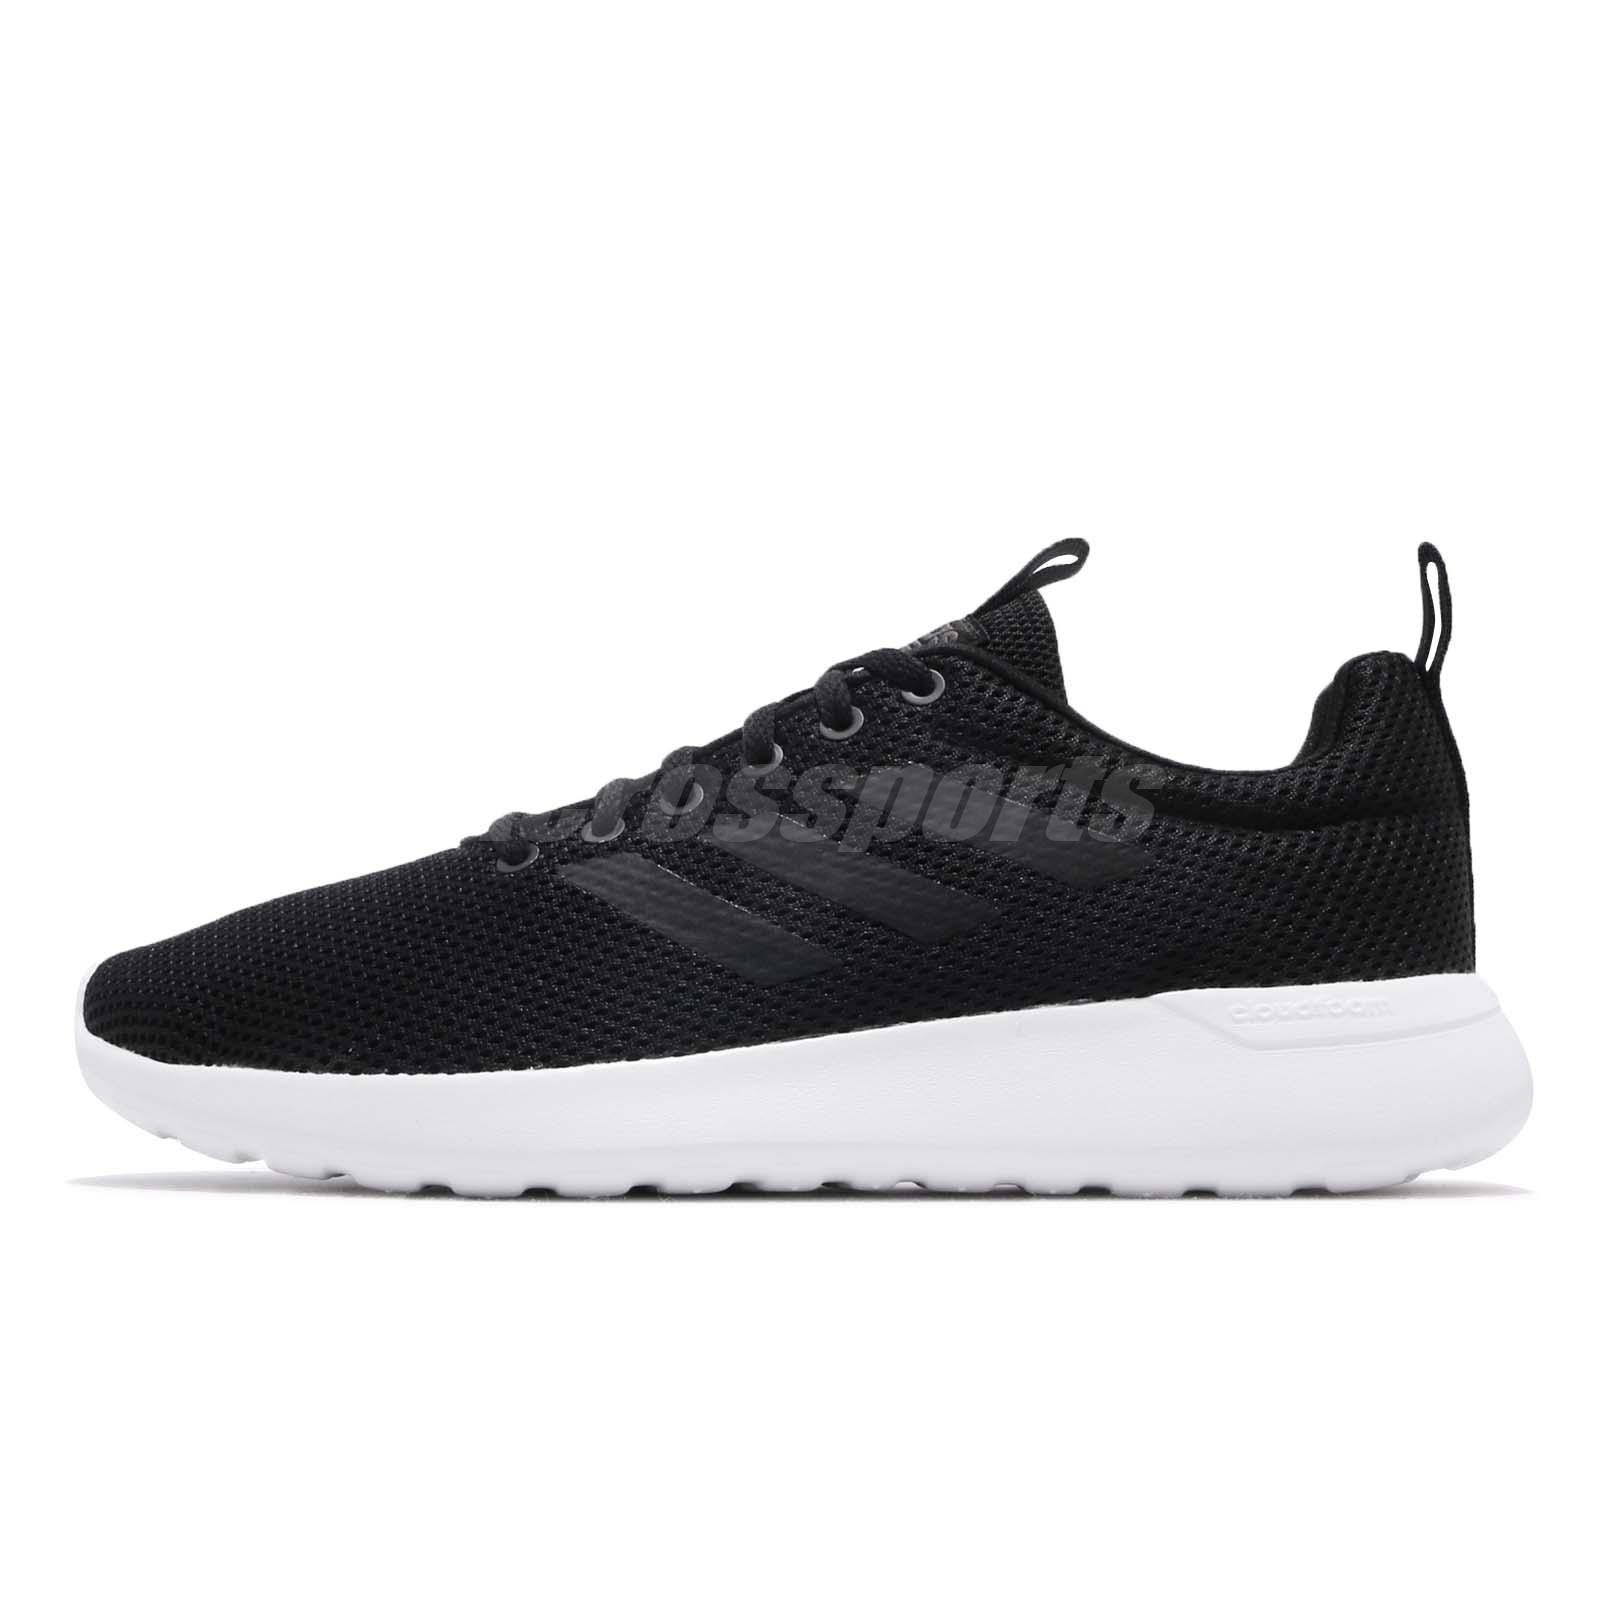 check out de5b4 6a740 adidas Lite Racer CLN Black Carbon White Men Running Shoes Sneakers B96569